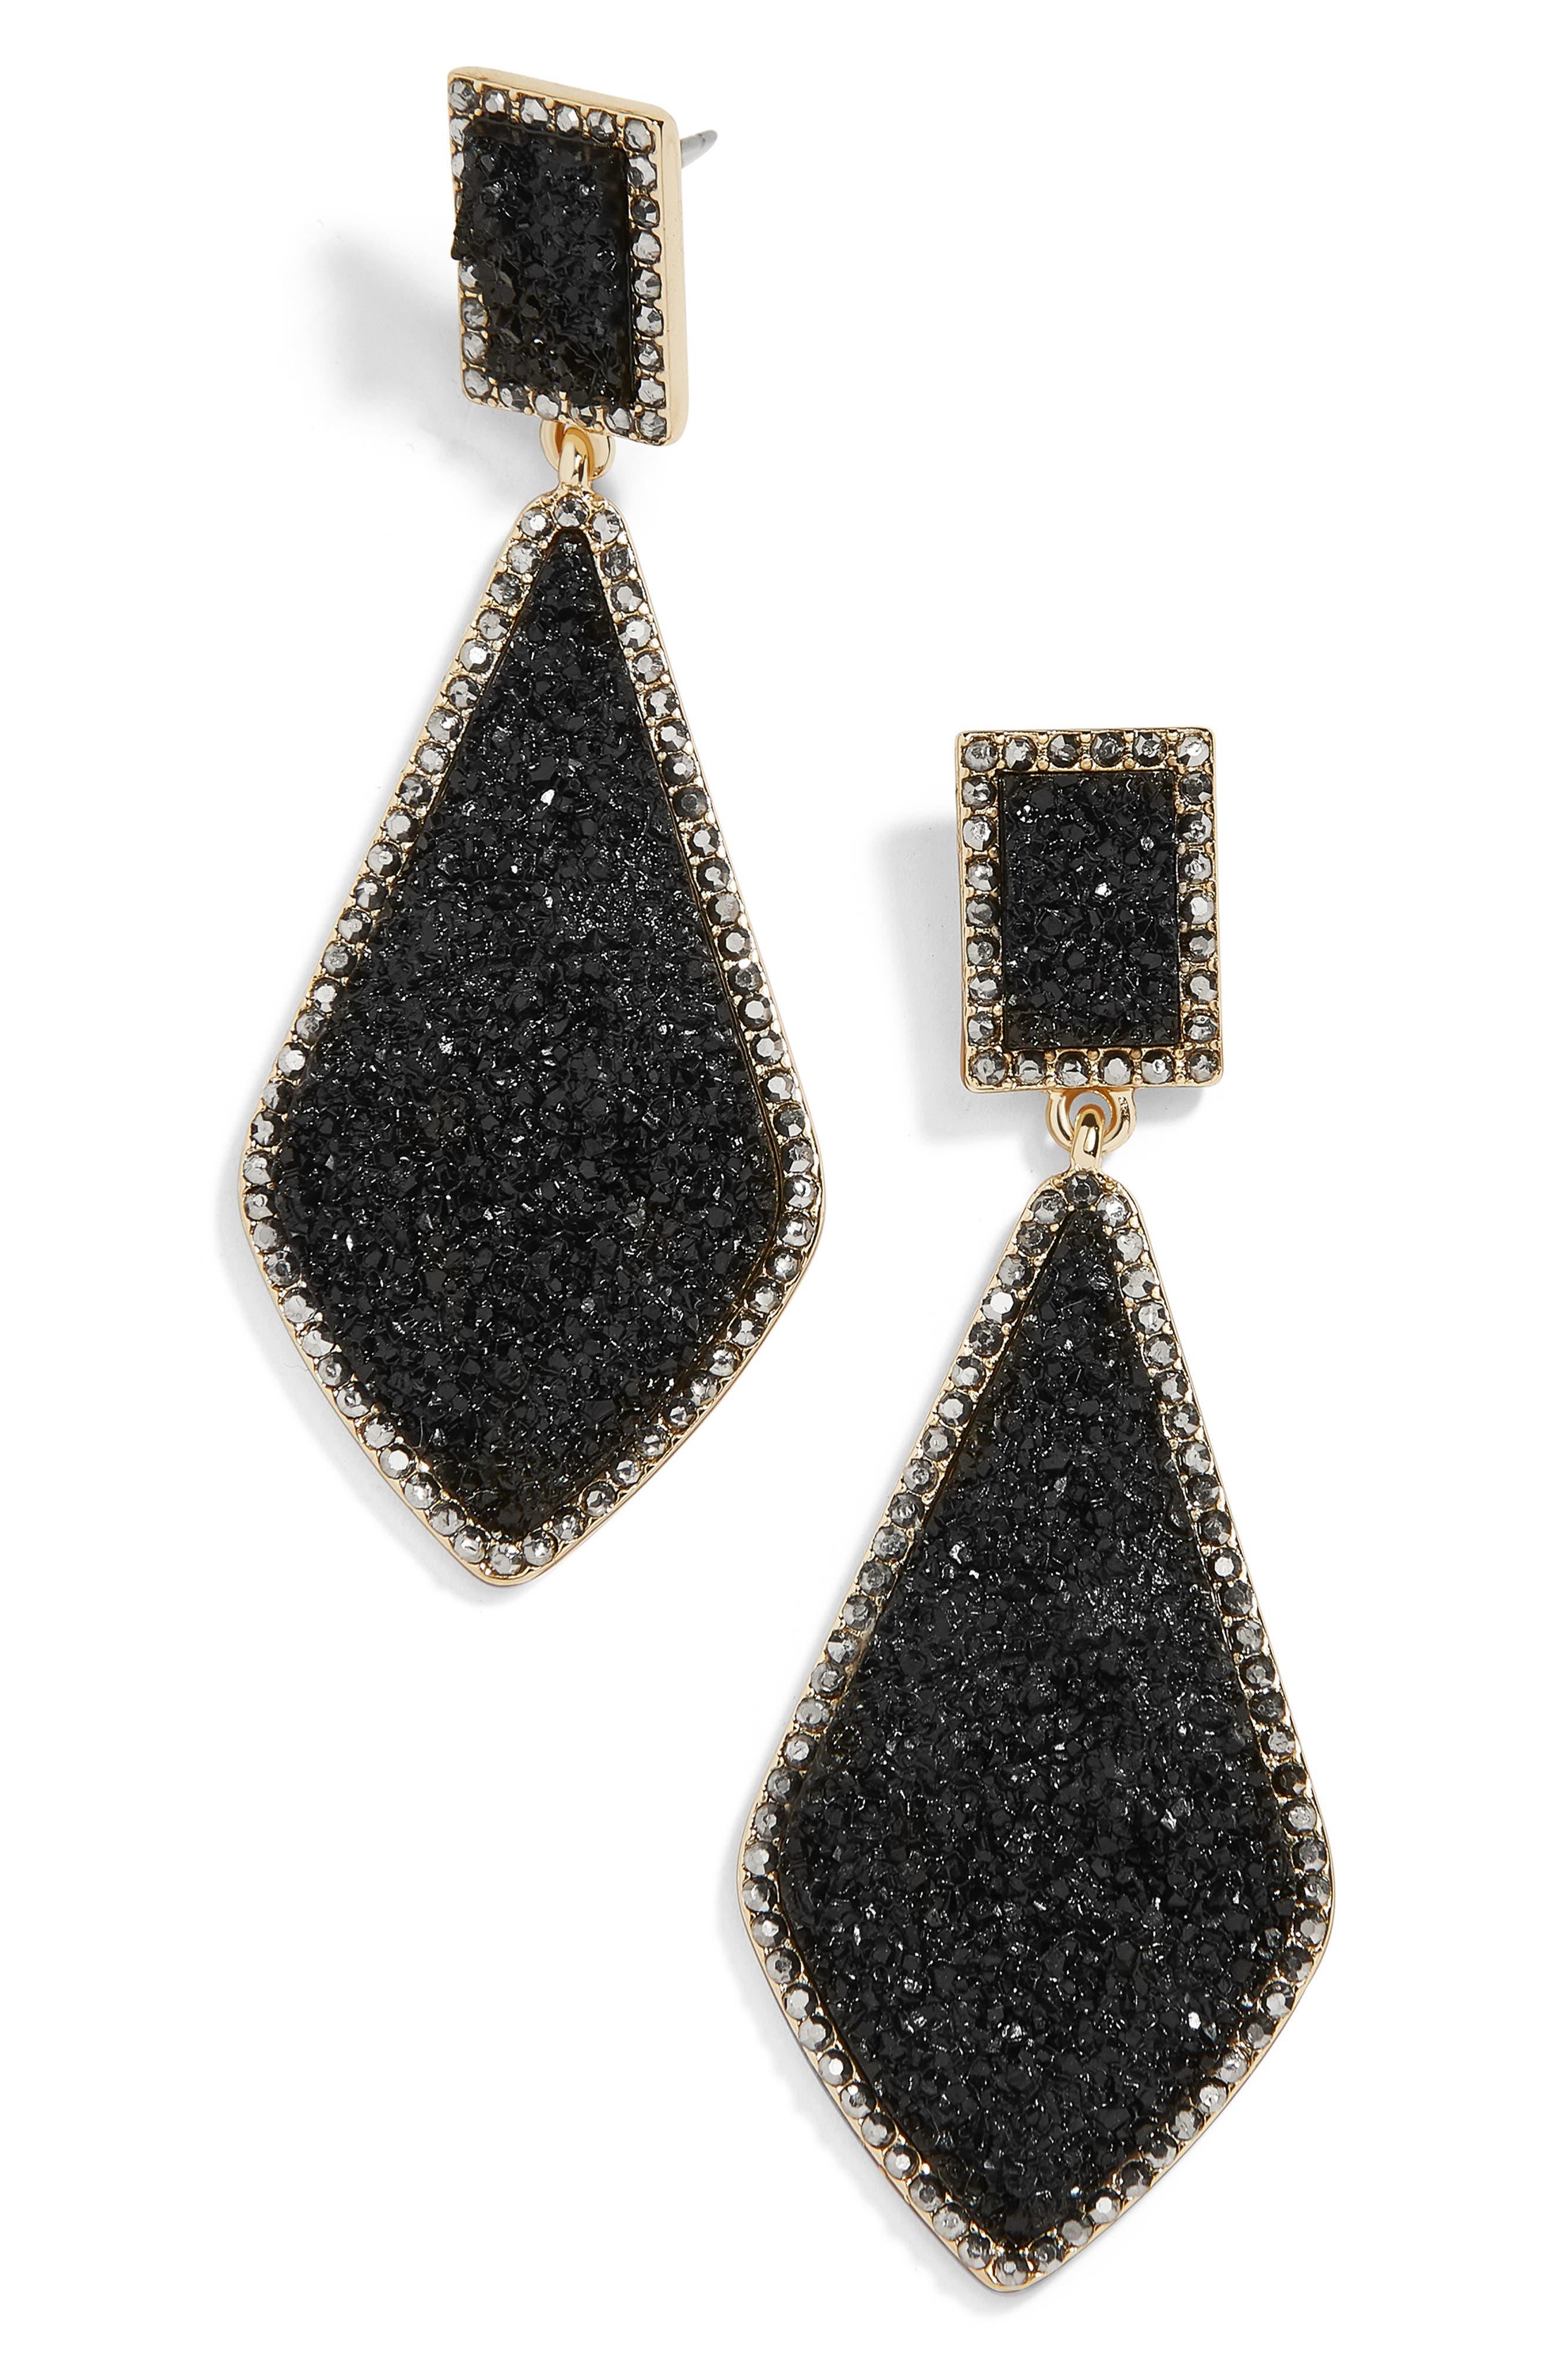 BAUBLEBAR, Twilight Drop Earrings, Main thumbnail 1, color, BLACK